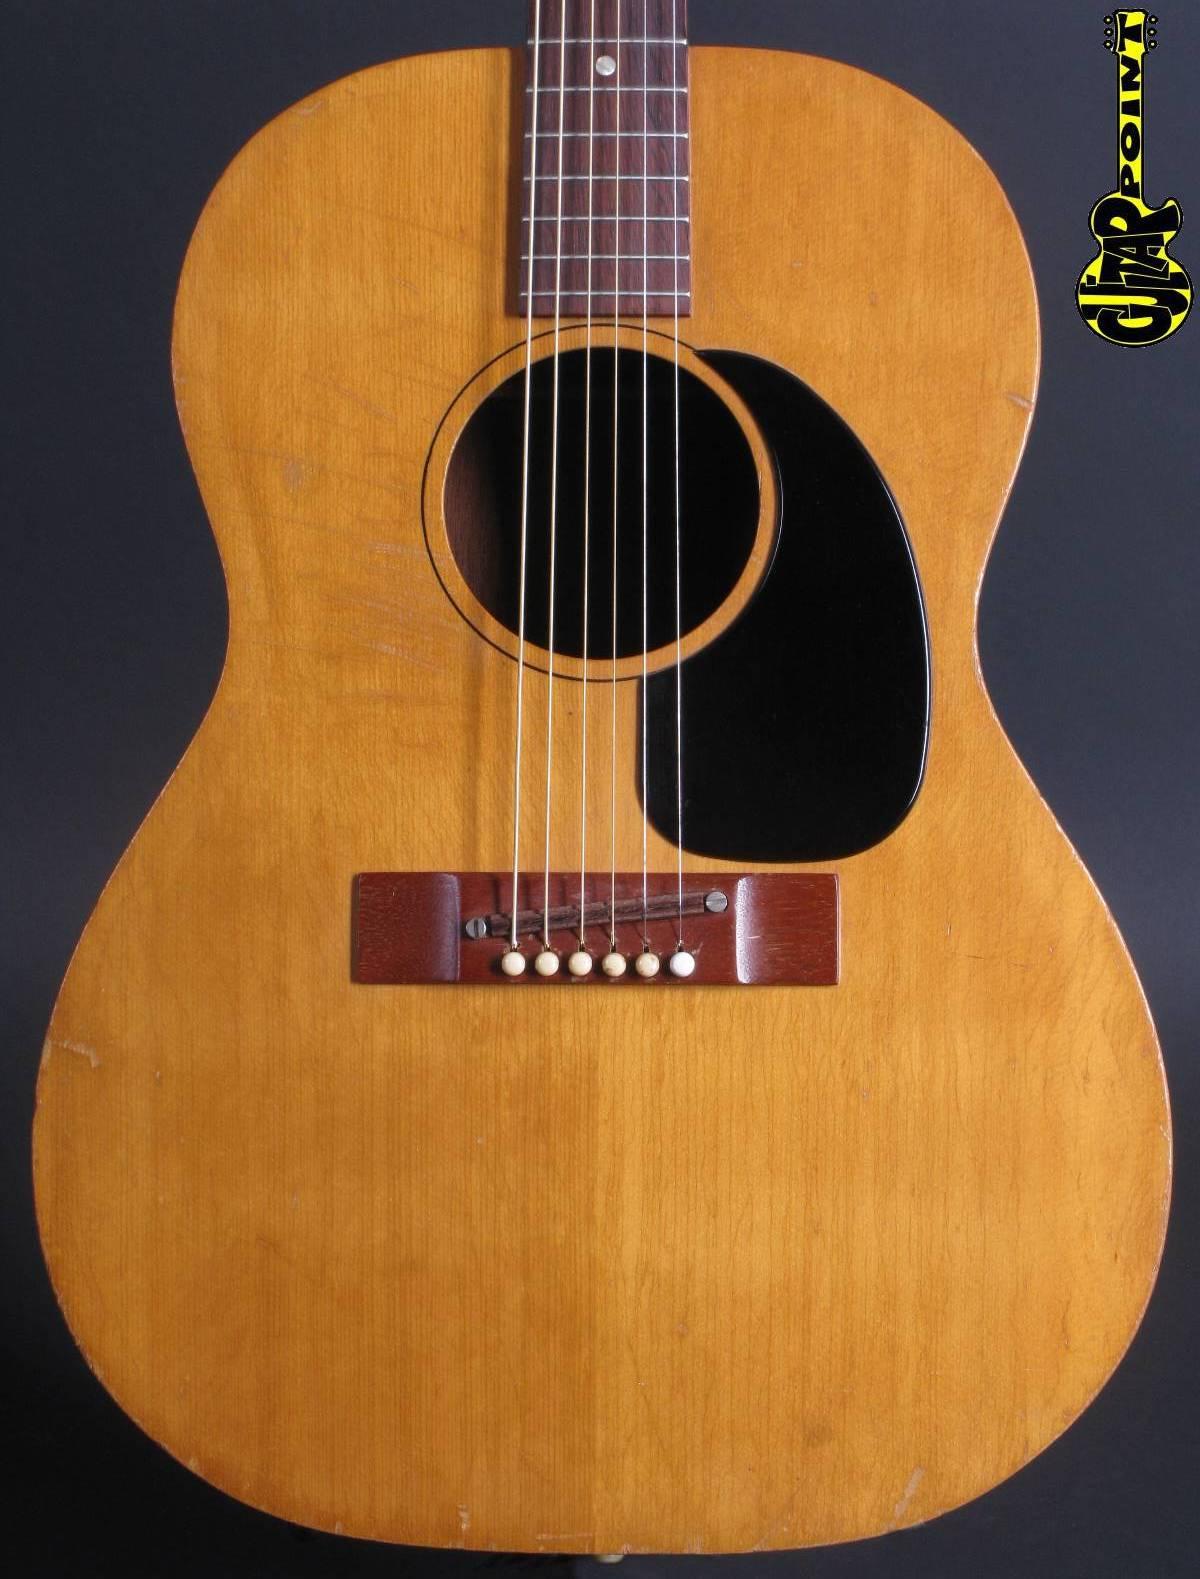 1969 Gibson B-15 - Natural